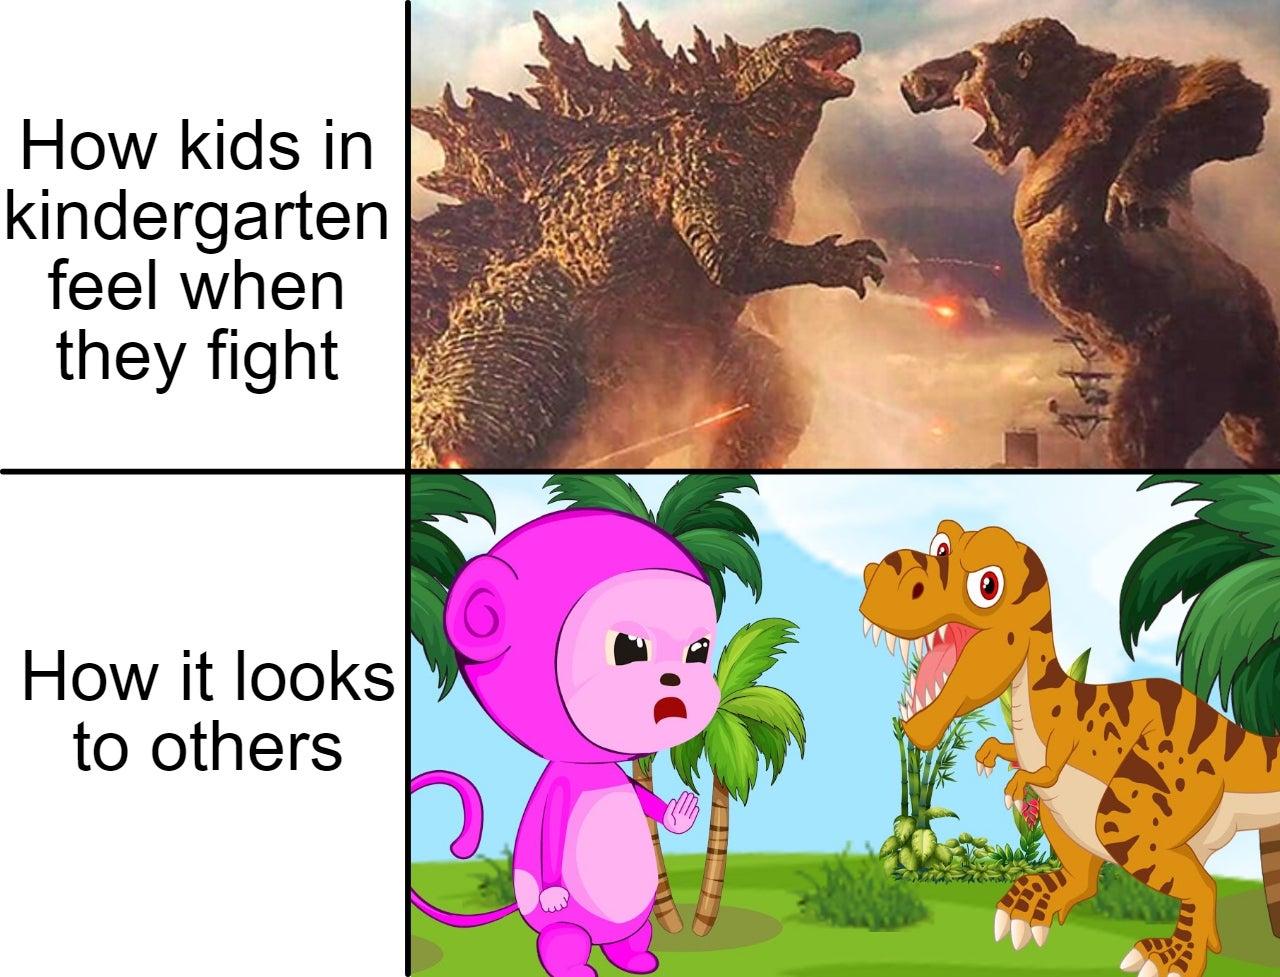 Memes about kindergarten